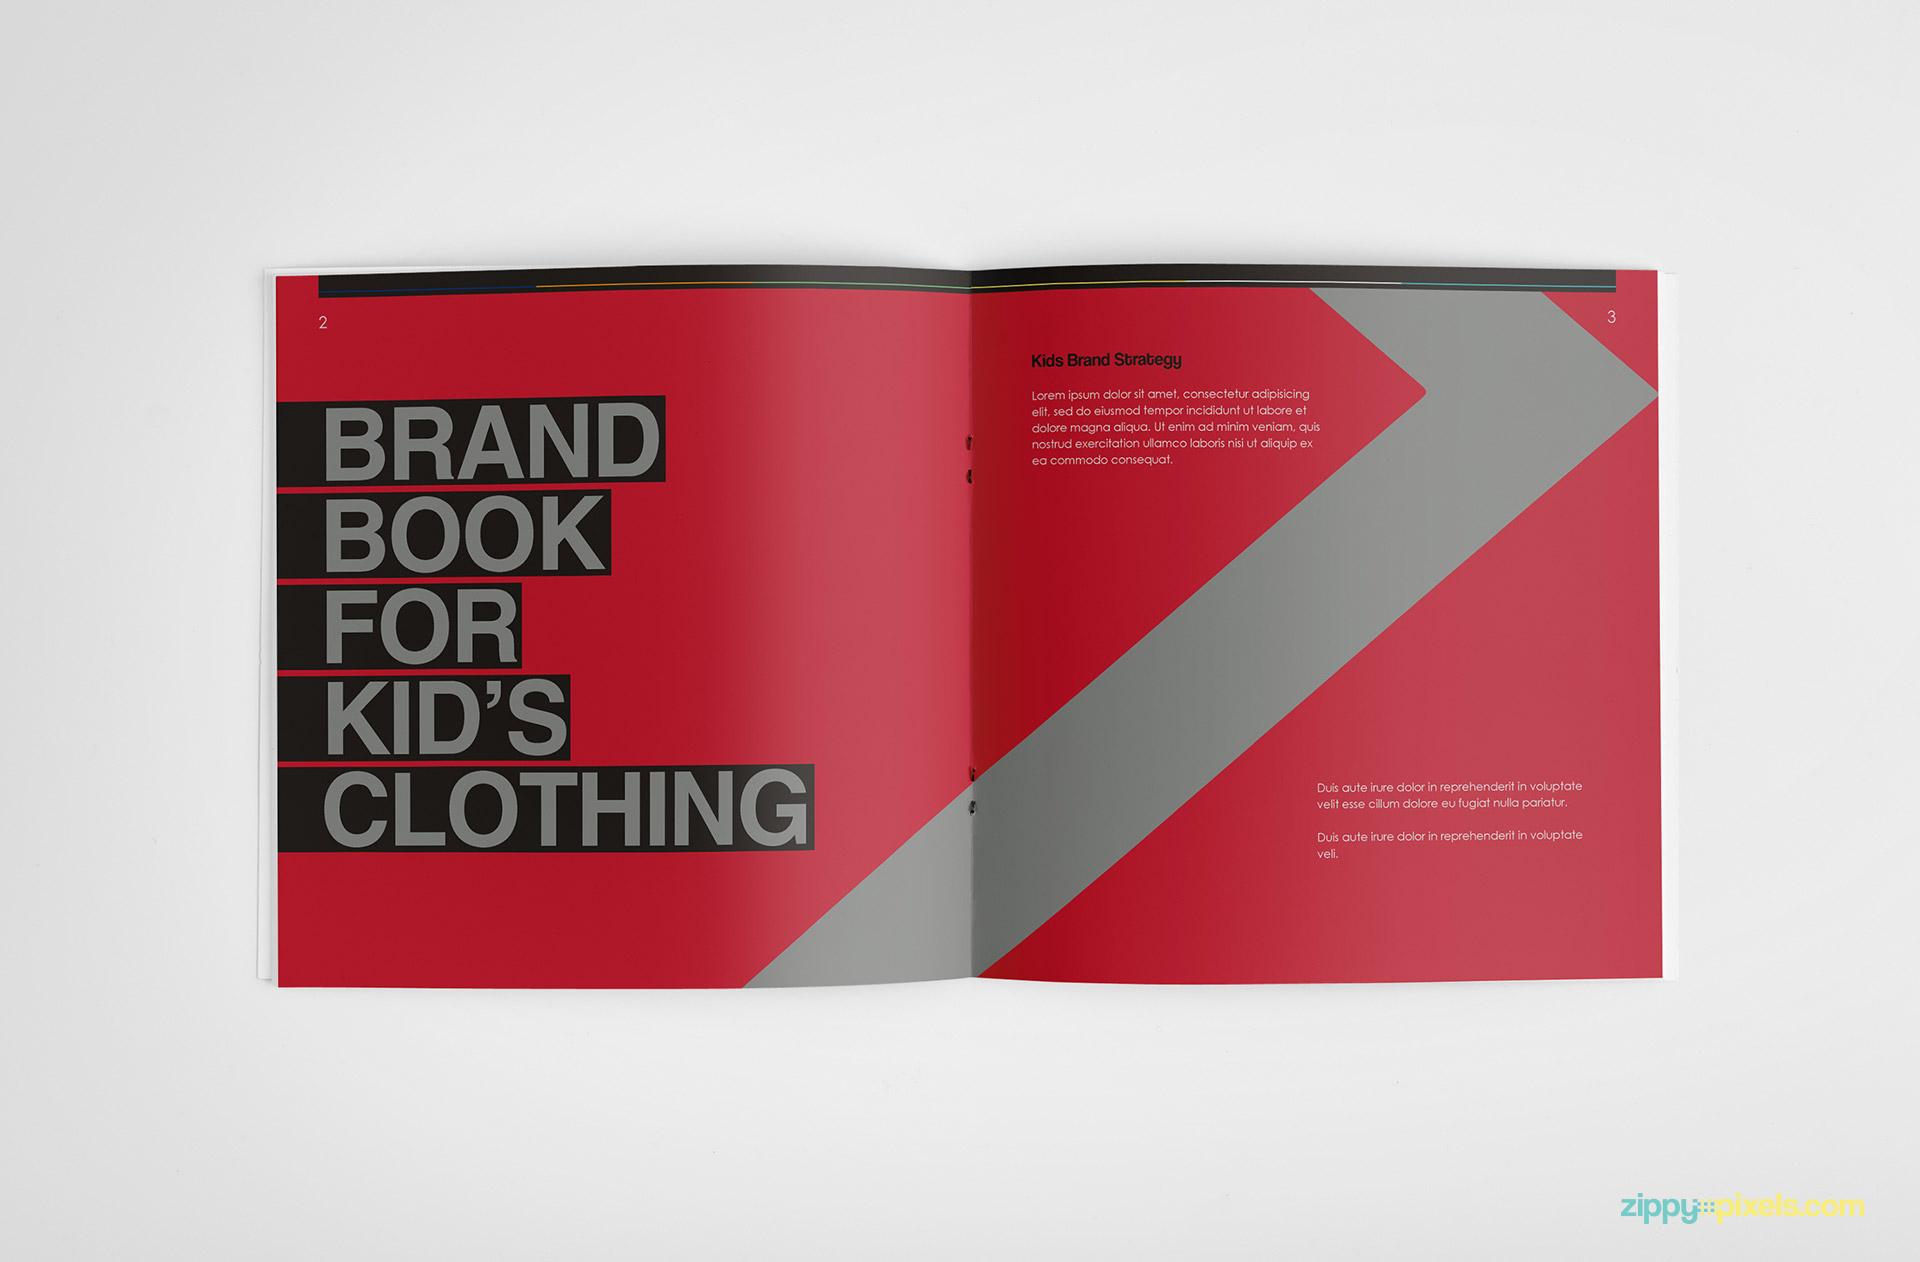 brand identity guidelines template brandbook zippypixels. Black Bedroom Furniture Sets. Home Design Ideas